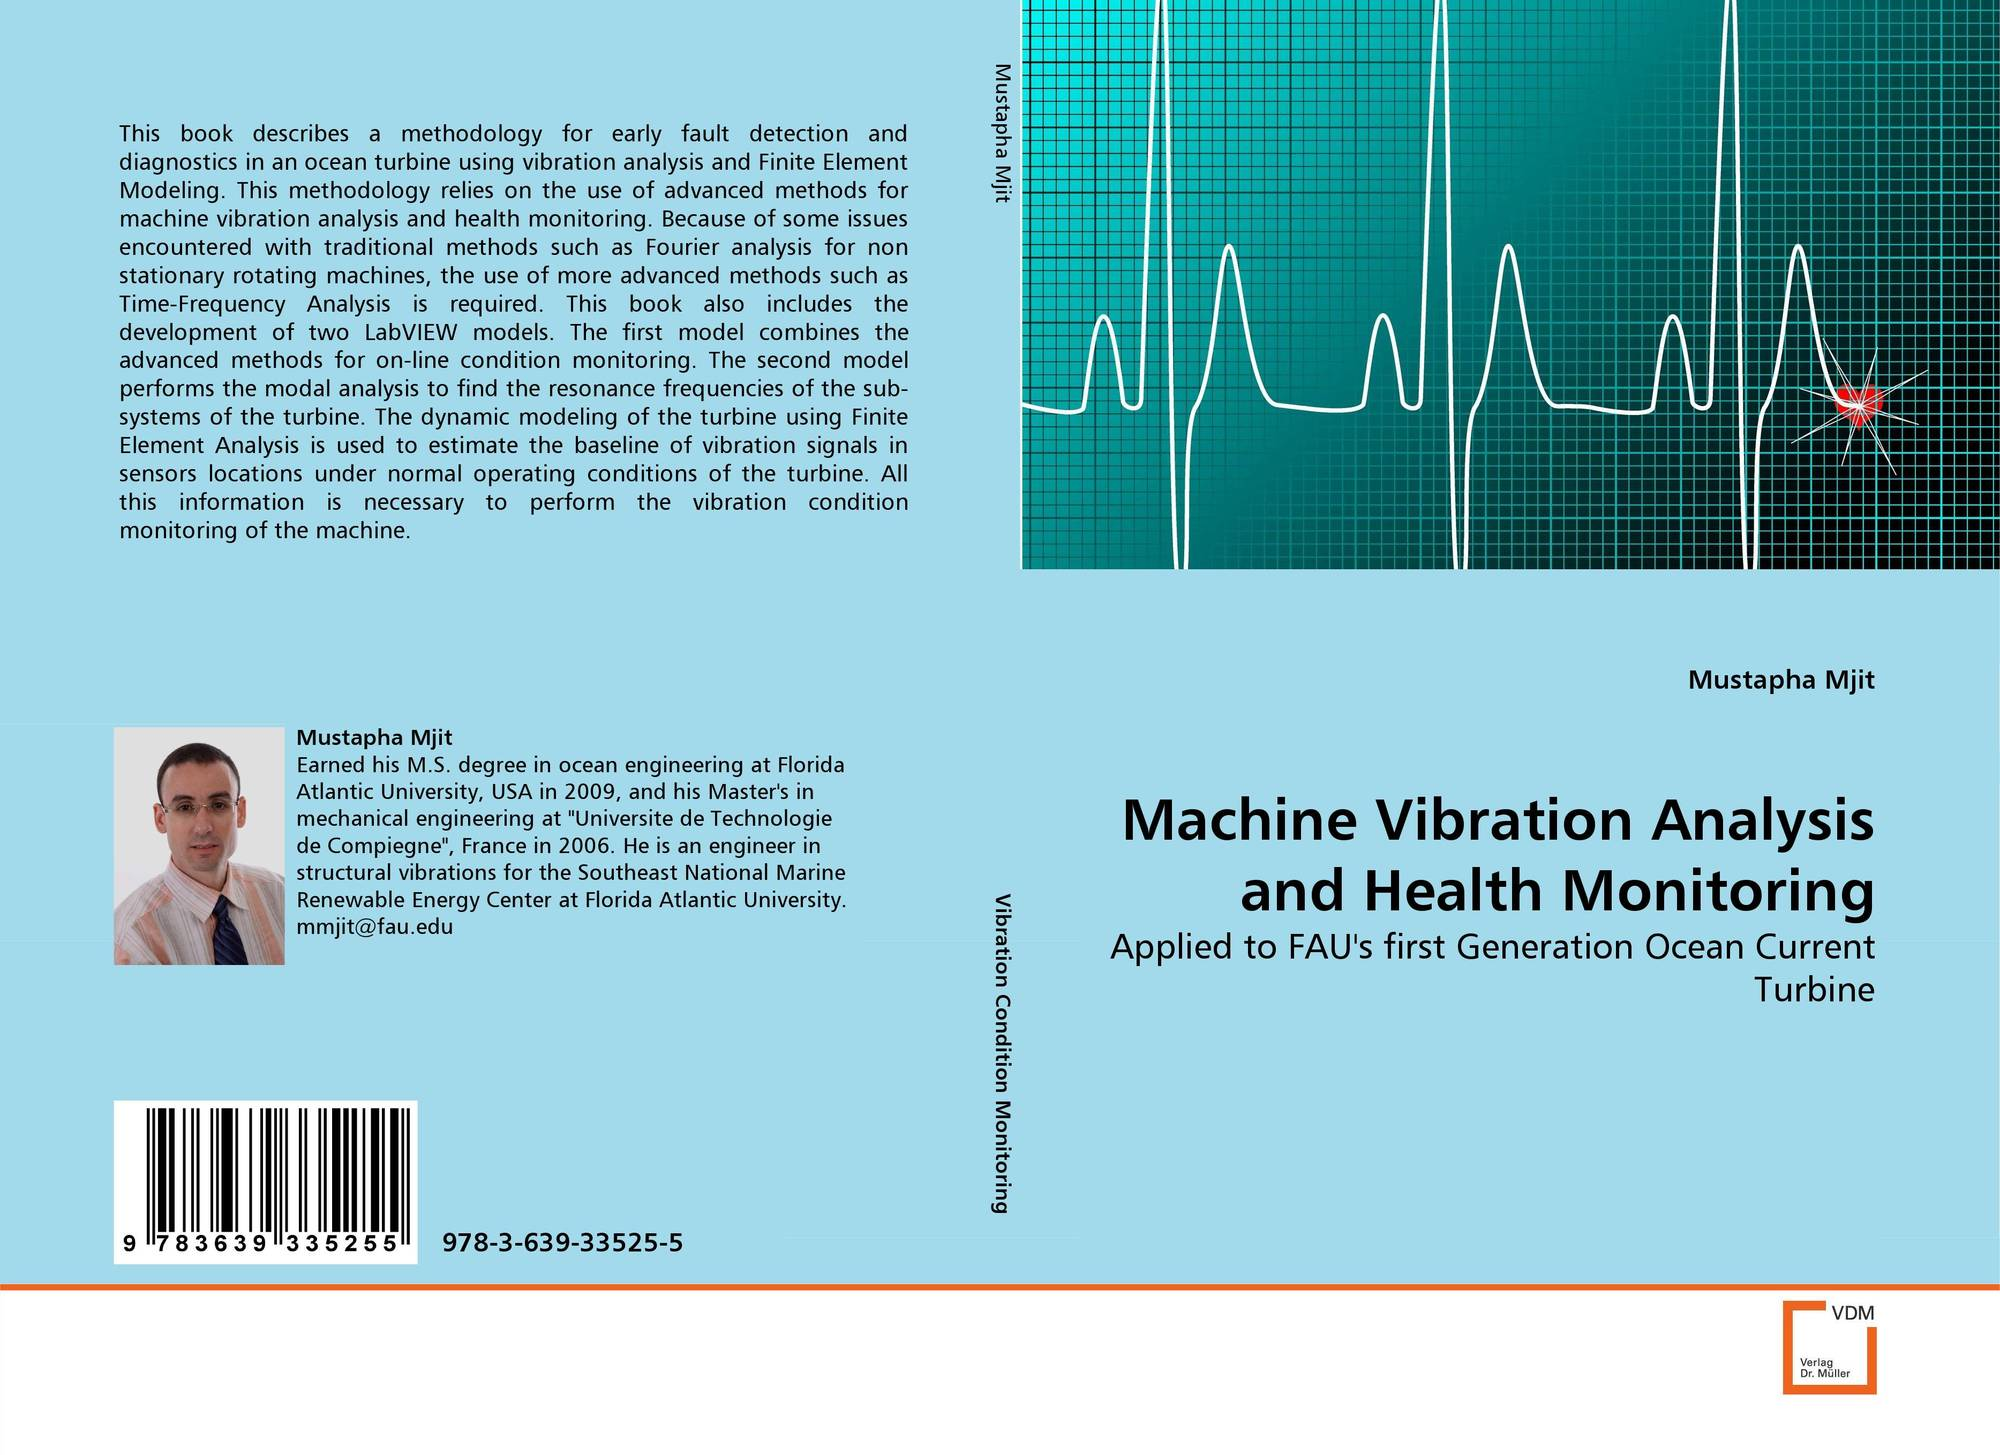 Machine Vibration Analysis and Health Monitoring, 978-3-639